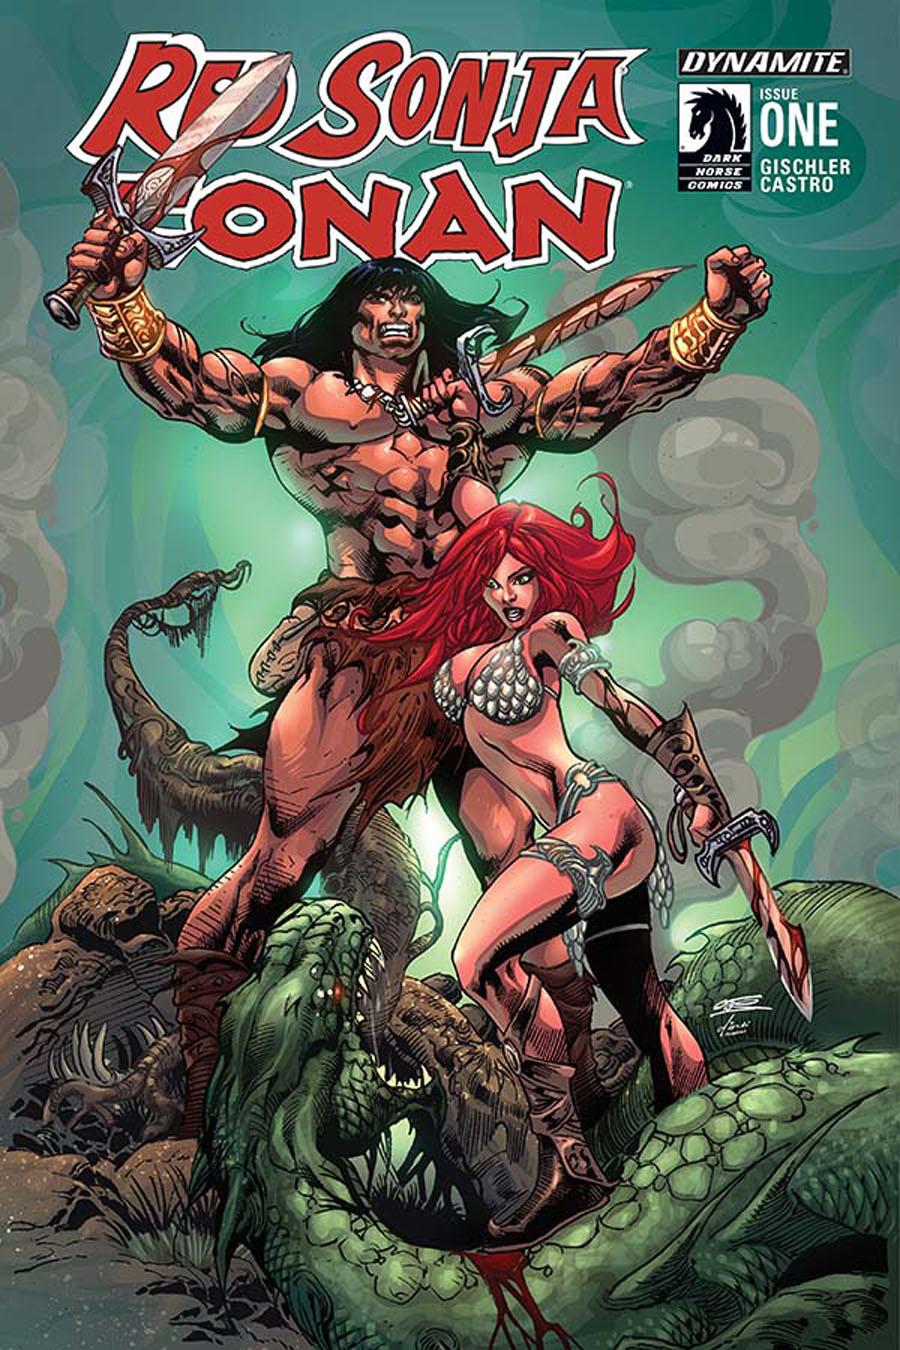 Red Sonja Conan #1 Cover C Variant Roberto Castro Subscription Cover